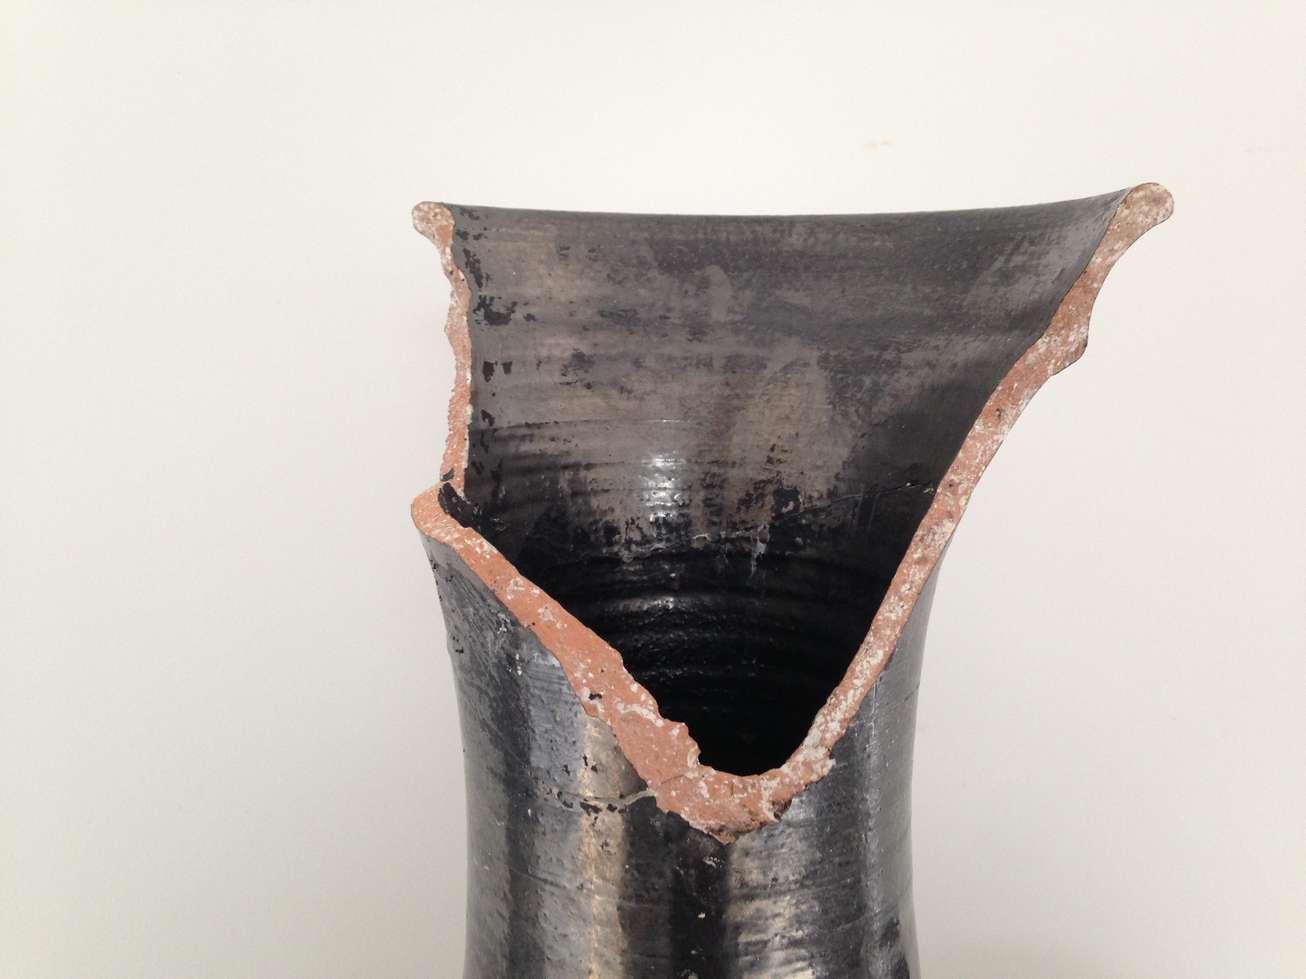 vase-gres-emaille-email-jean-marais-ceramiste-vallauris-jean-cocteau-restauration-art-ancien-restaurarte.jpg